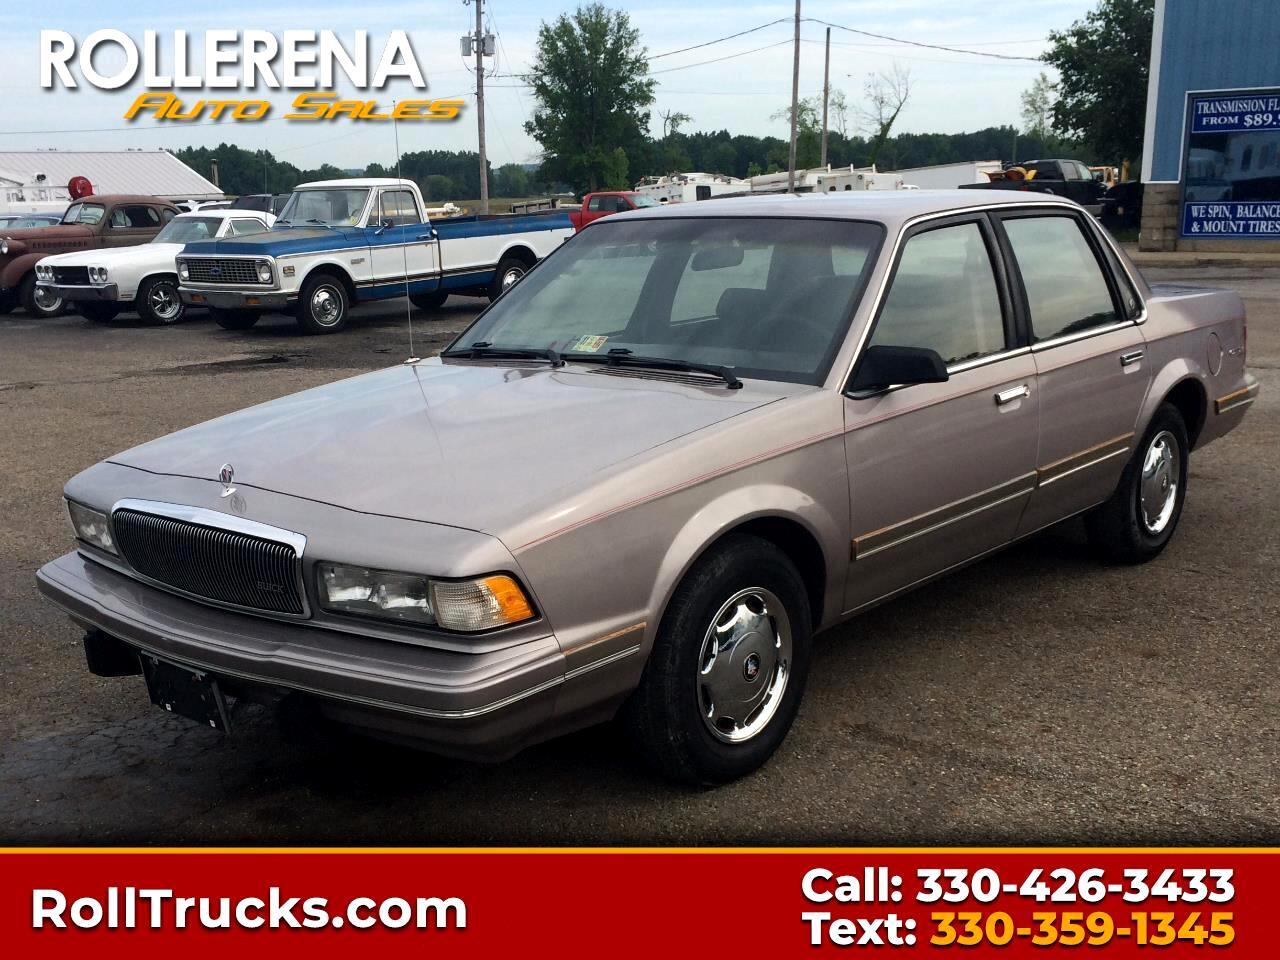 1996 Buick Century Sedan